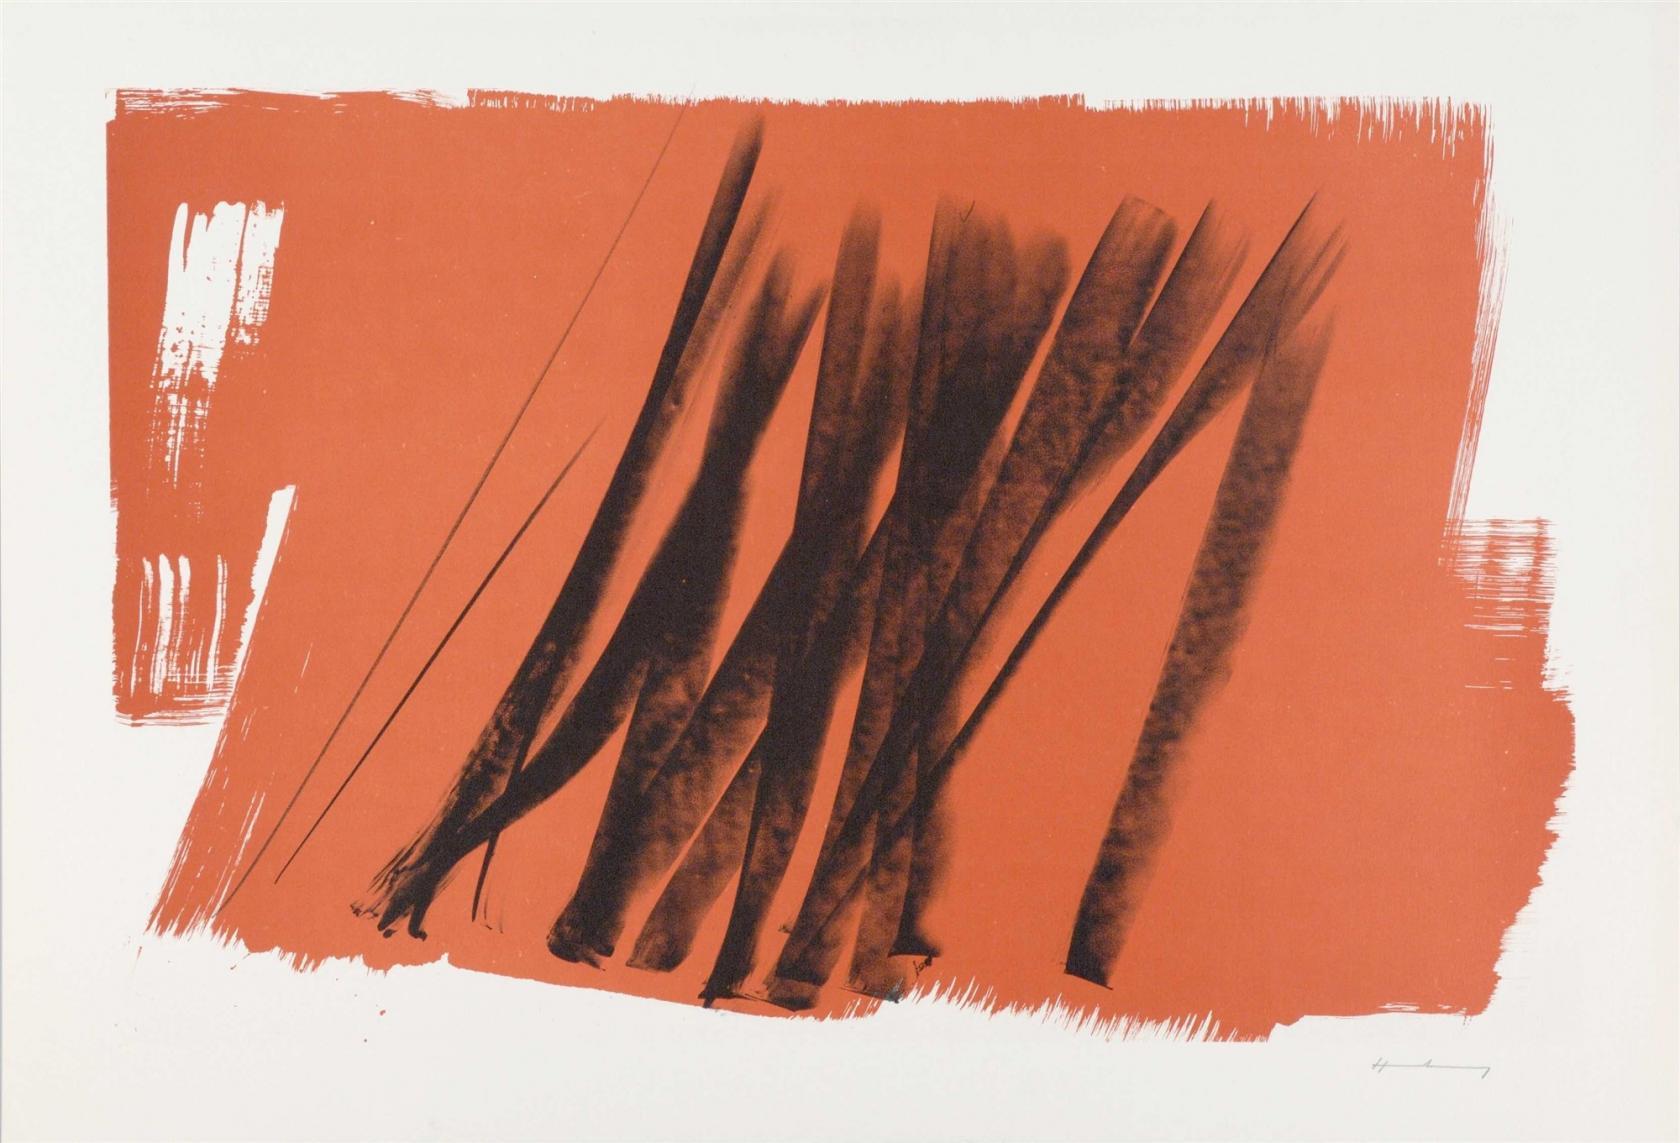 Midi de Sainte Croix art visuel, exposition Hans Hartung Nantes